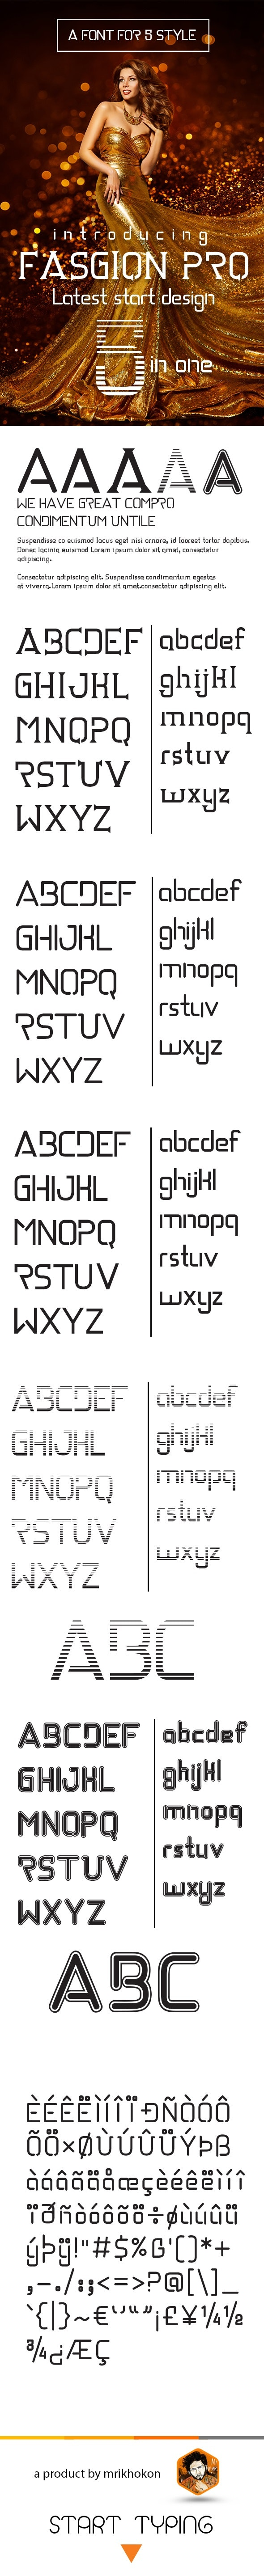 Fashion Pro - Serif Fonts